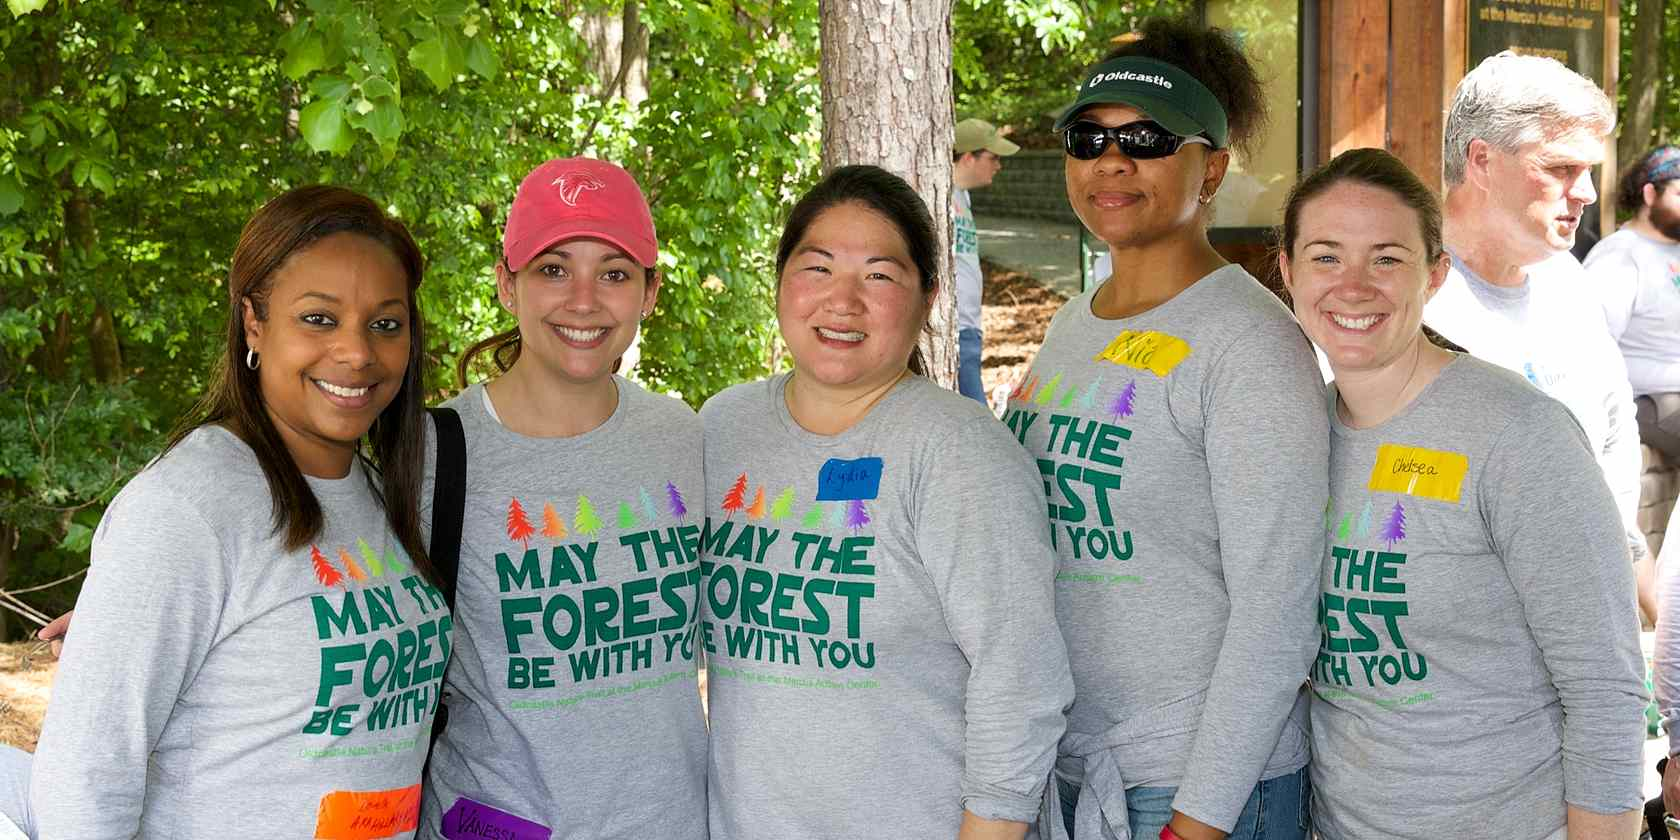 CRH team members at community day